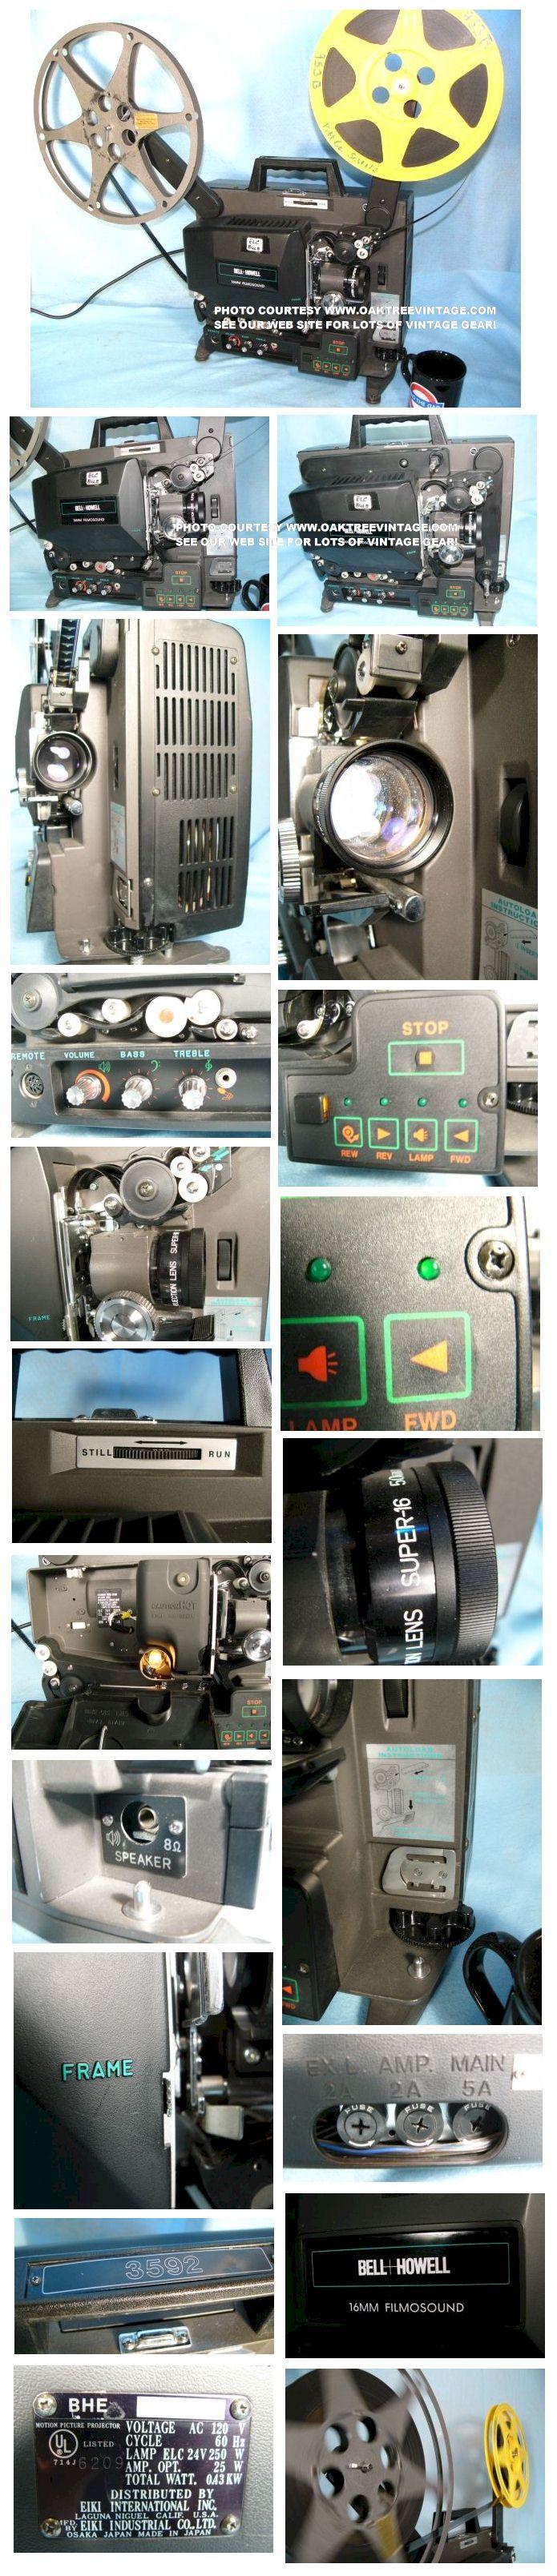 16mm Film Projectors - Archive Units